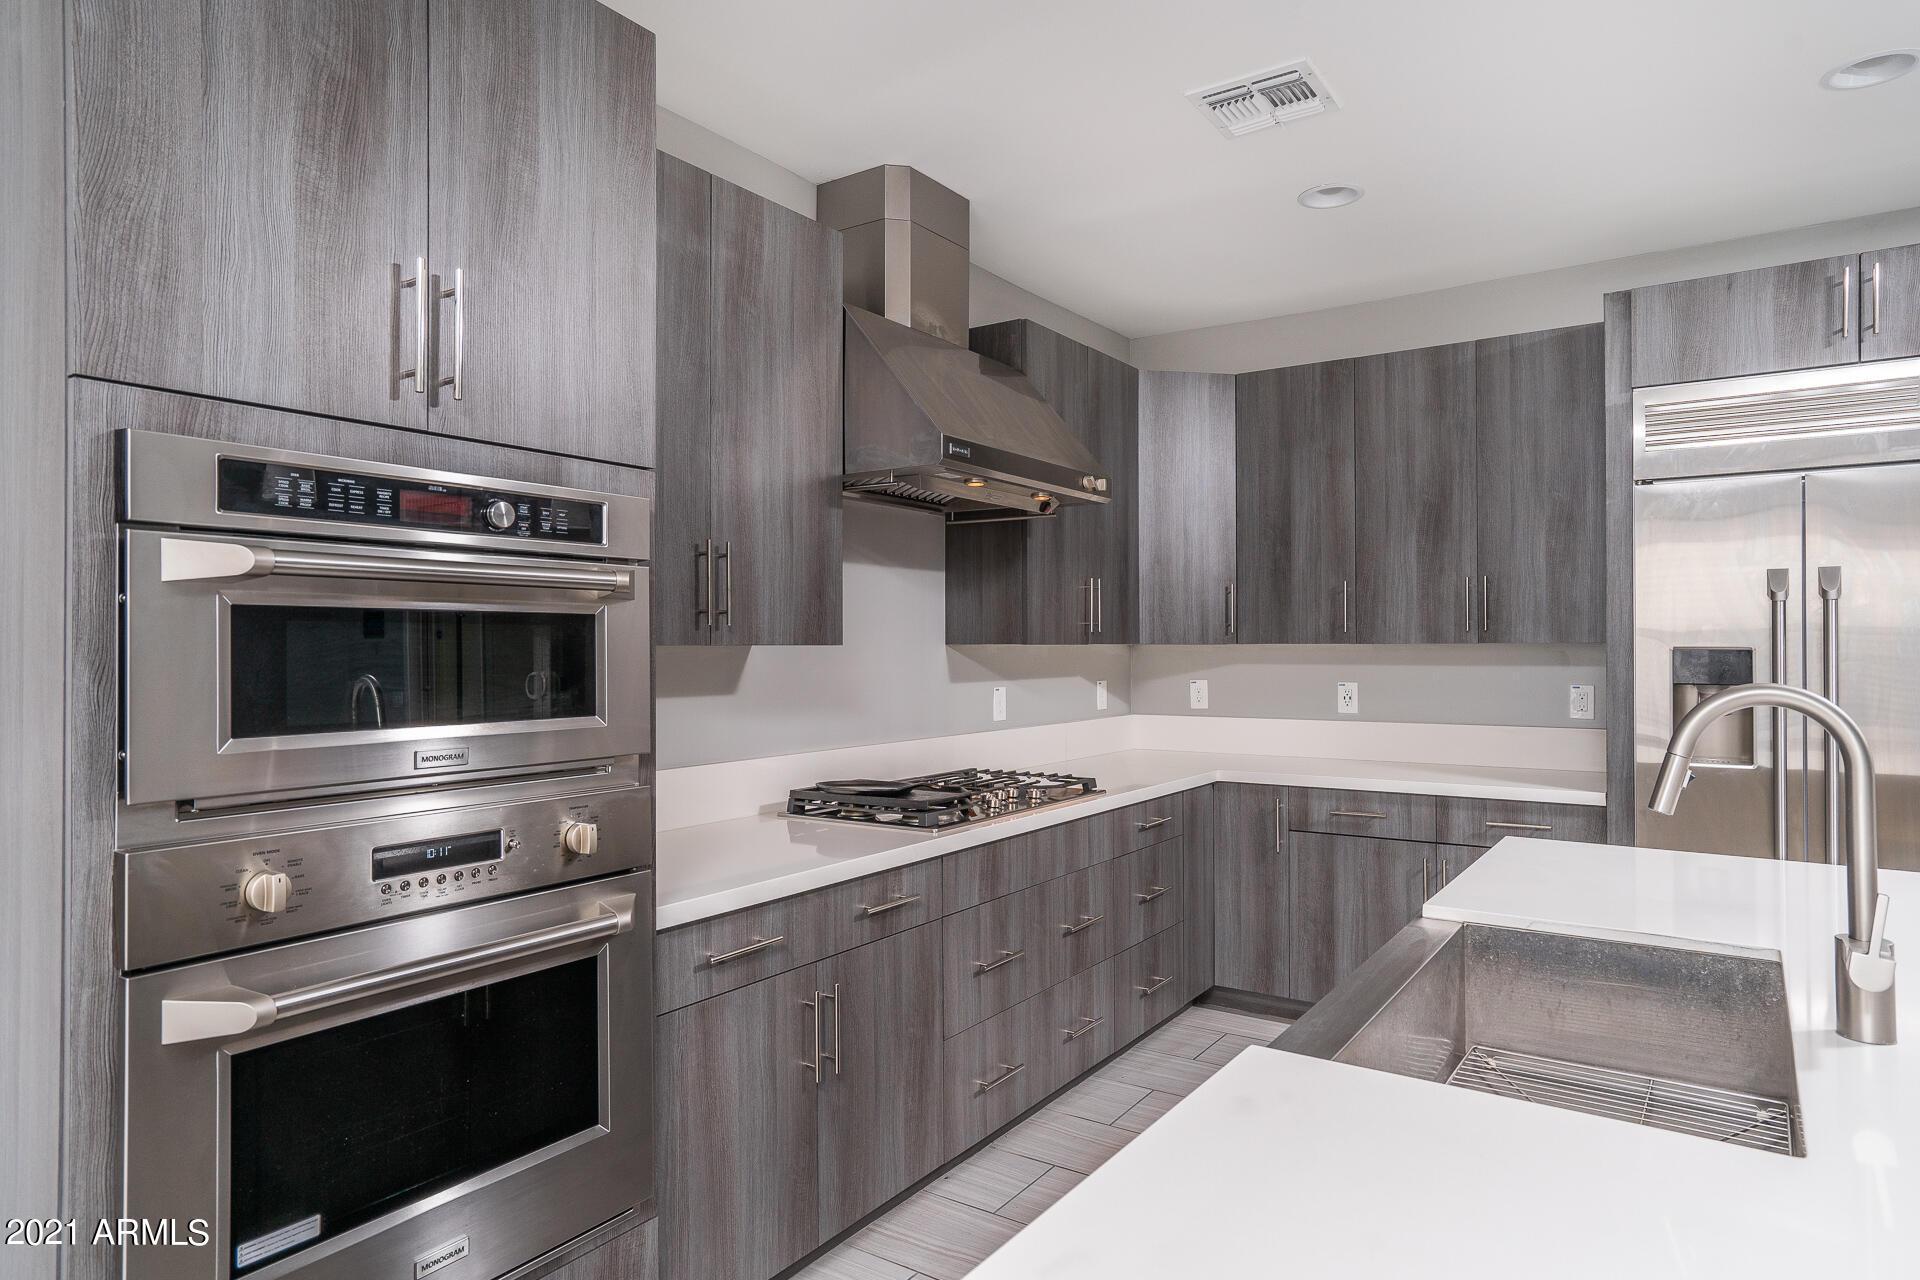 31710 24TH Drive, Phoenix, Arizona 85085, 3 Bedrooms Bedrooms, ,2.5 BathroomsBathrooms,Residential,For Sale,24TH,6265443